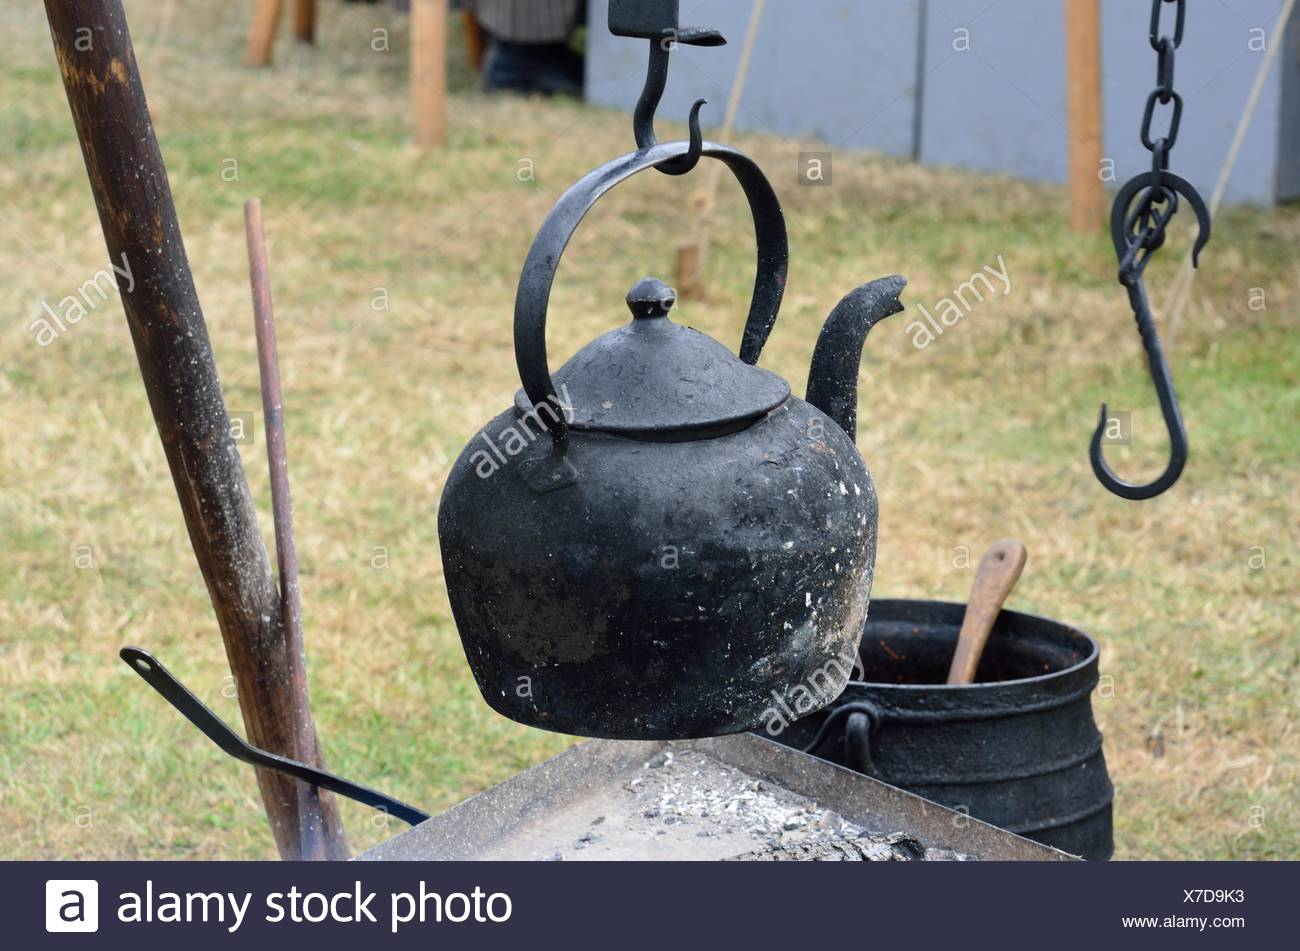 Old black kettle stock photo 279961447 alamy